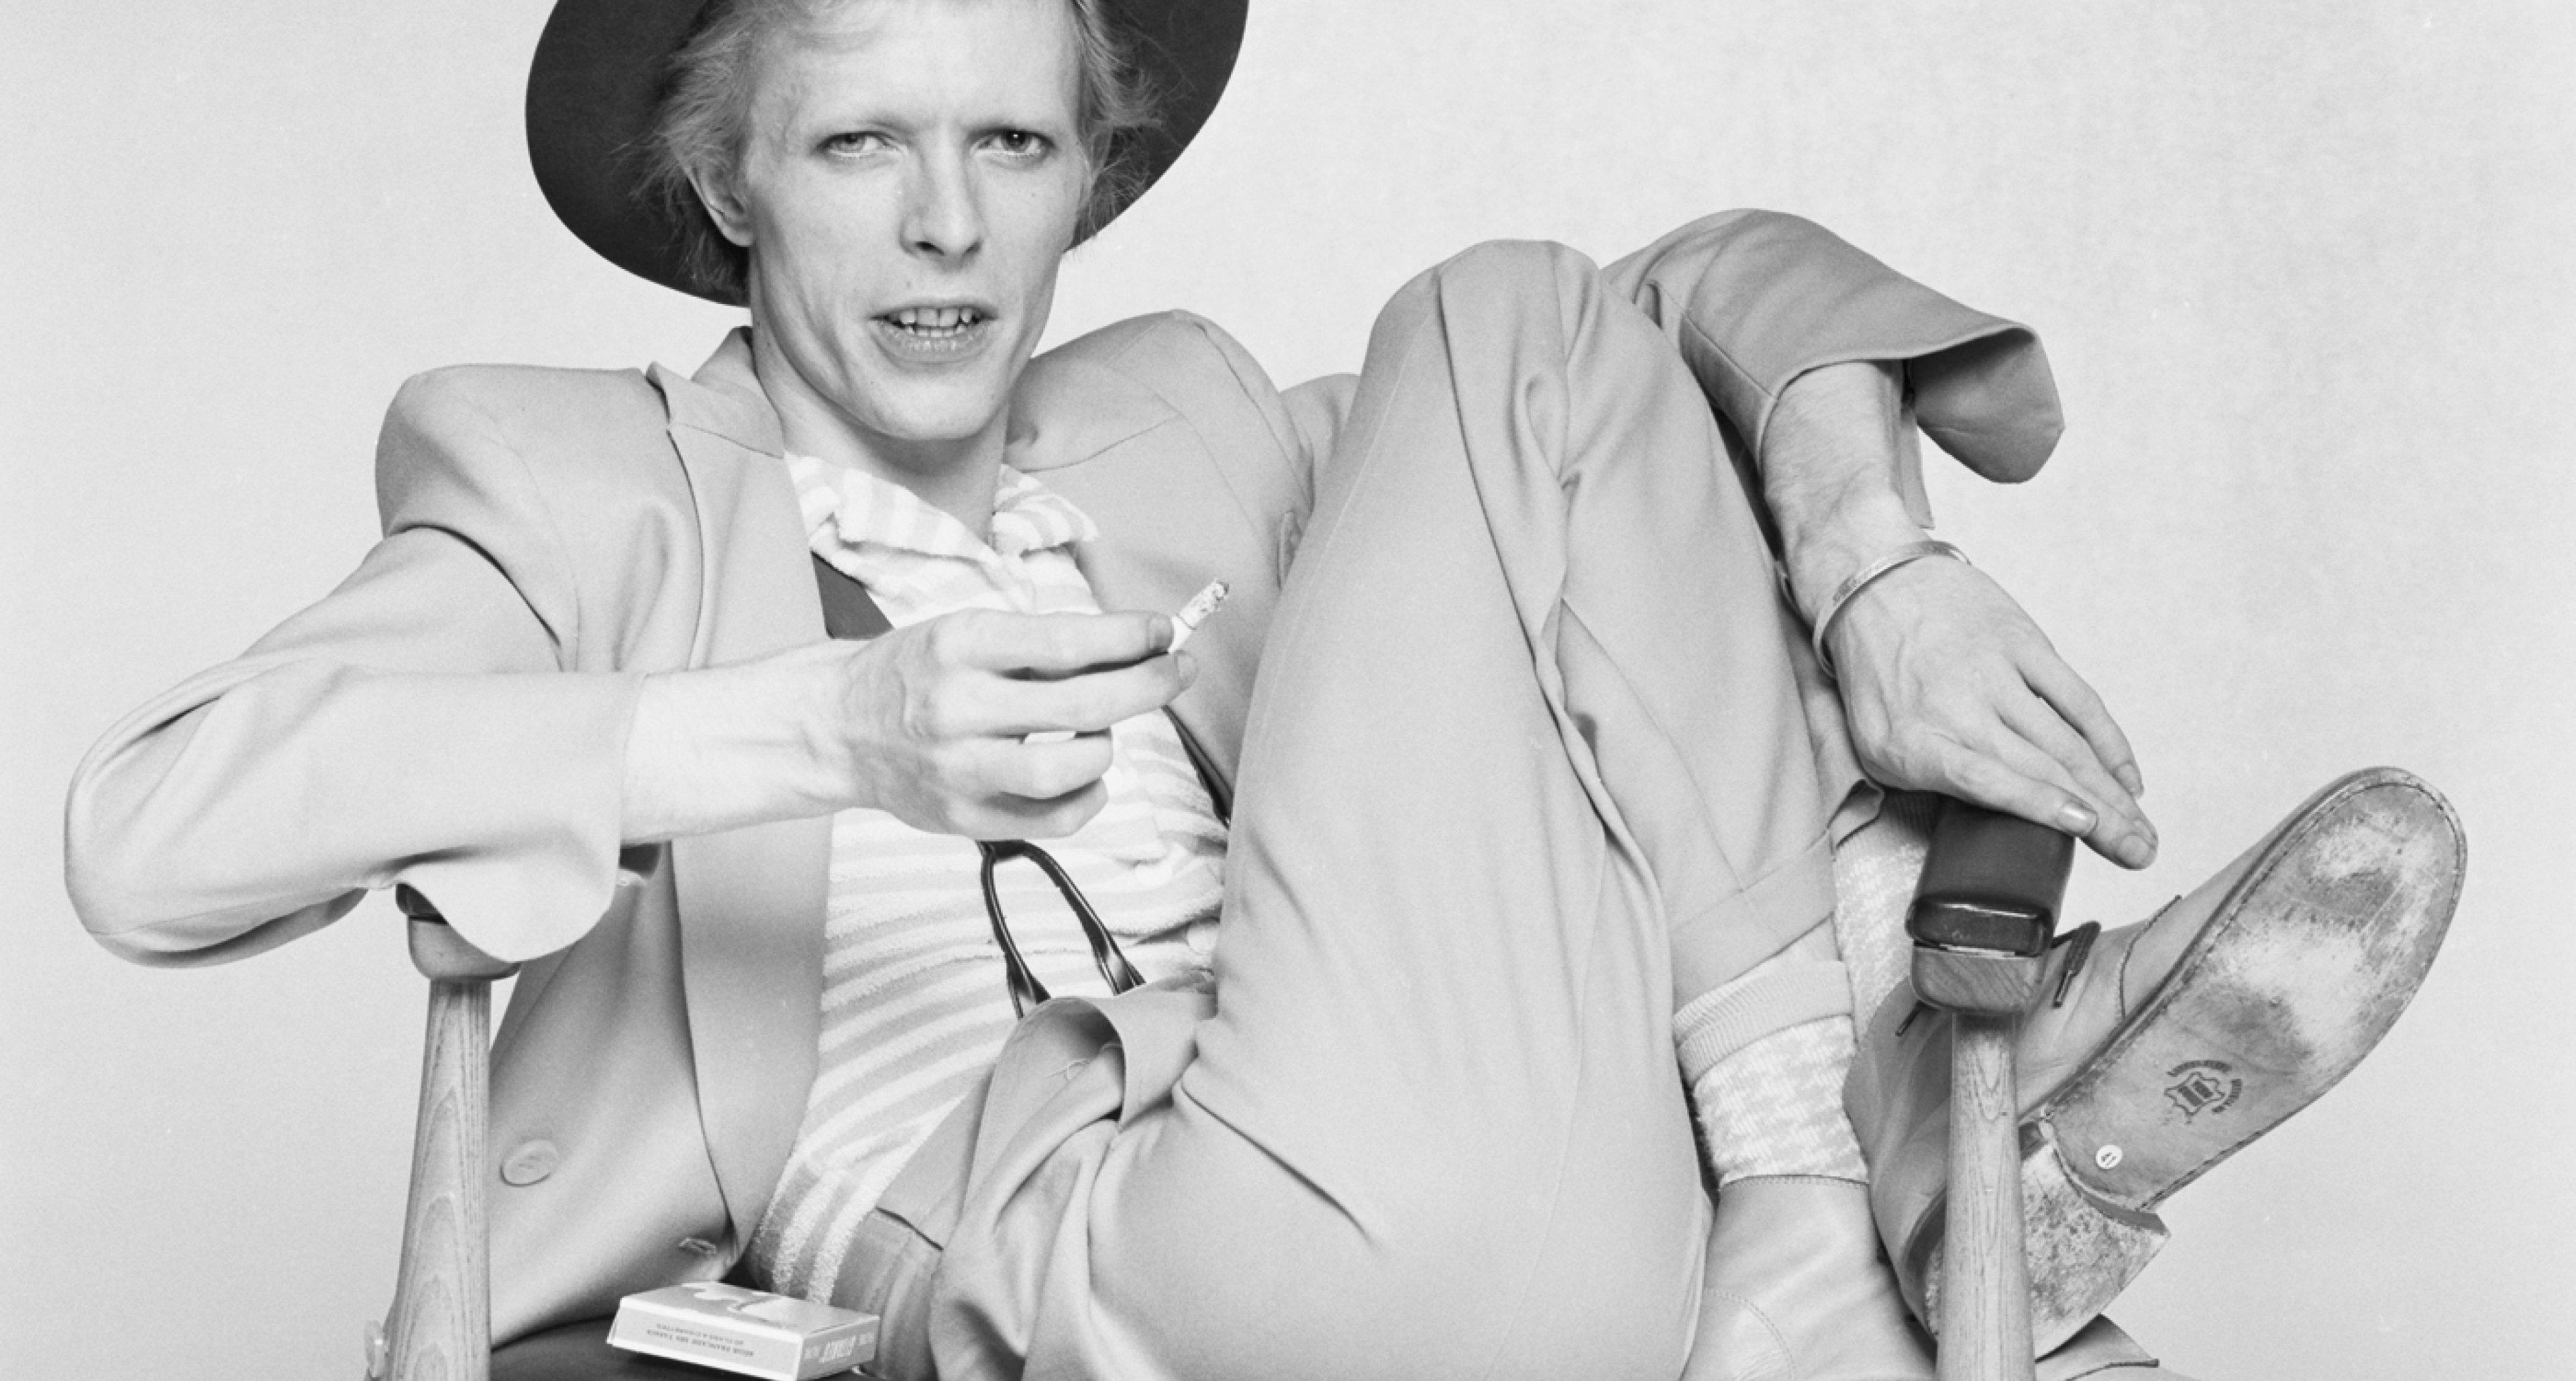 David Bowie - Terry O'Neill/Getty Images. Original Man, Copyright Gestalten 2014